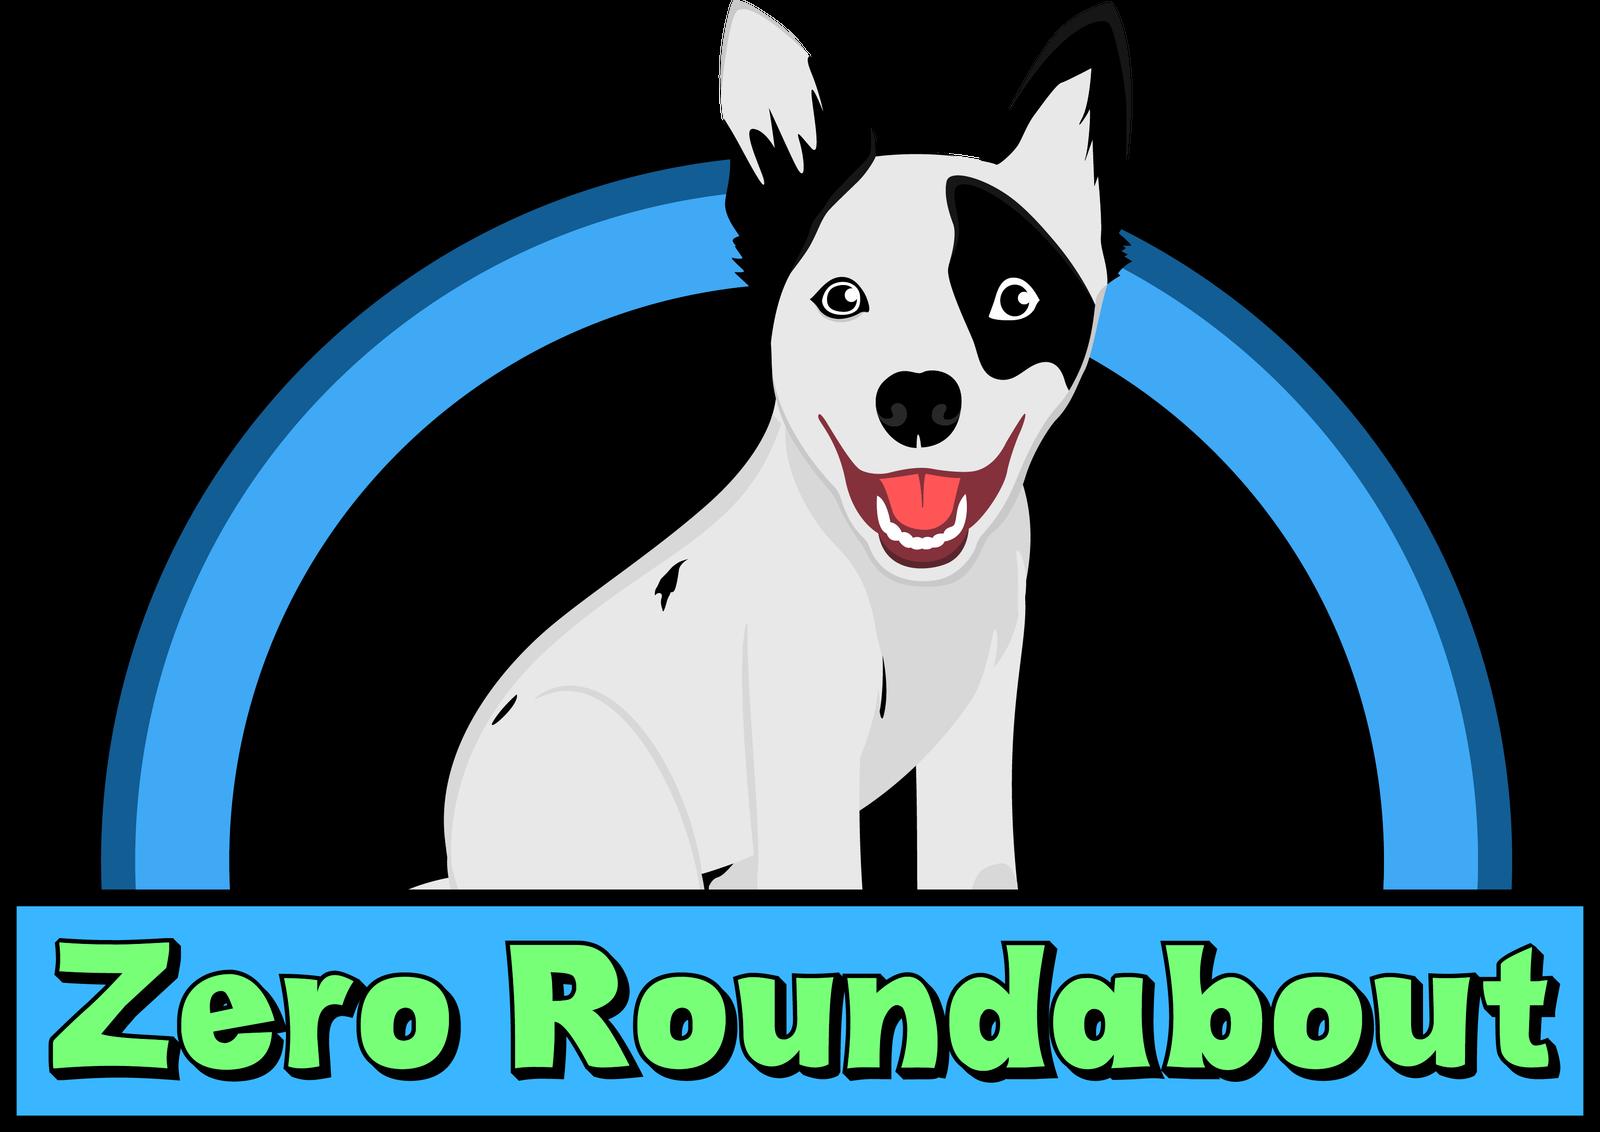 ZeroRoundabout